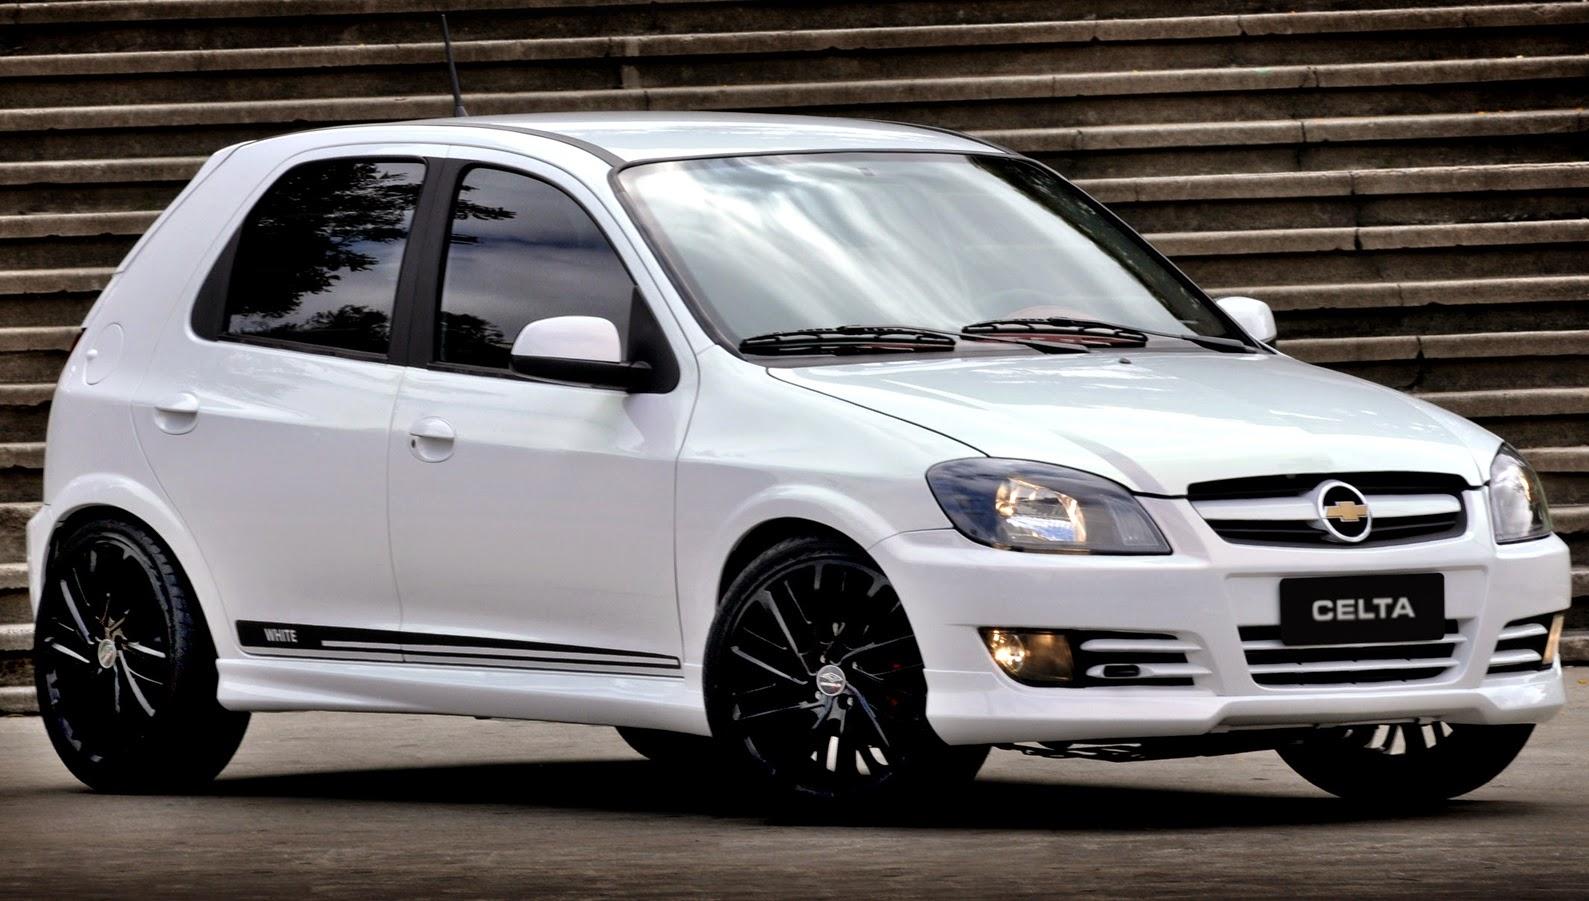 Chevrolet Celta deixa de ser produzido